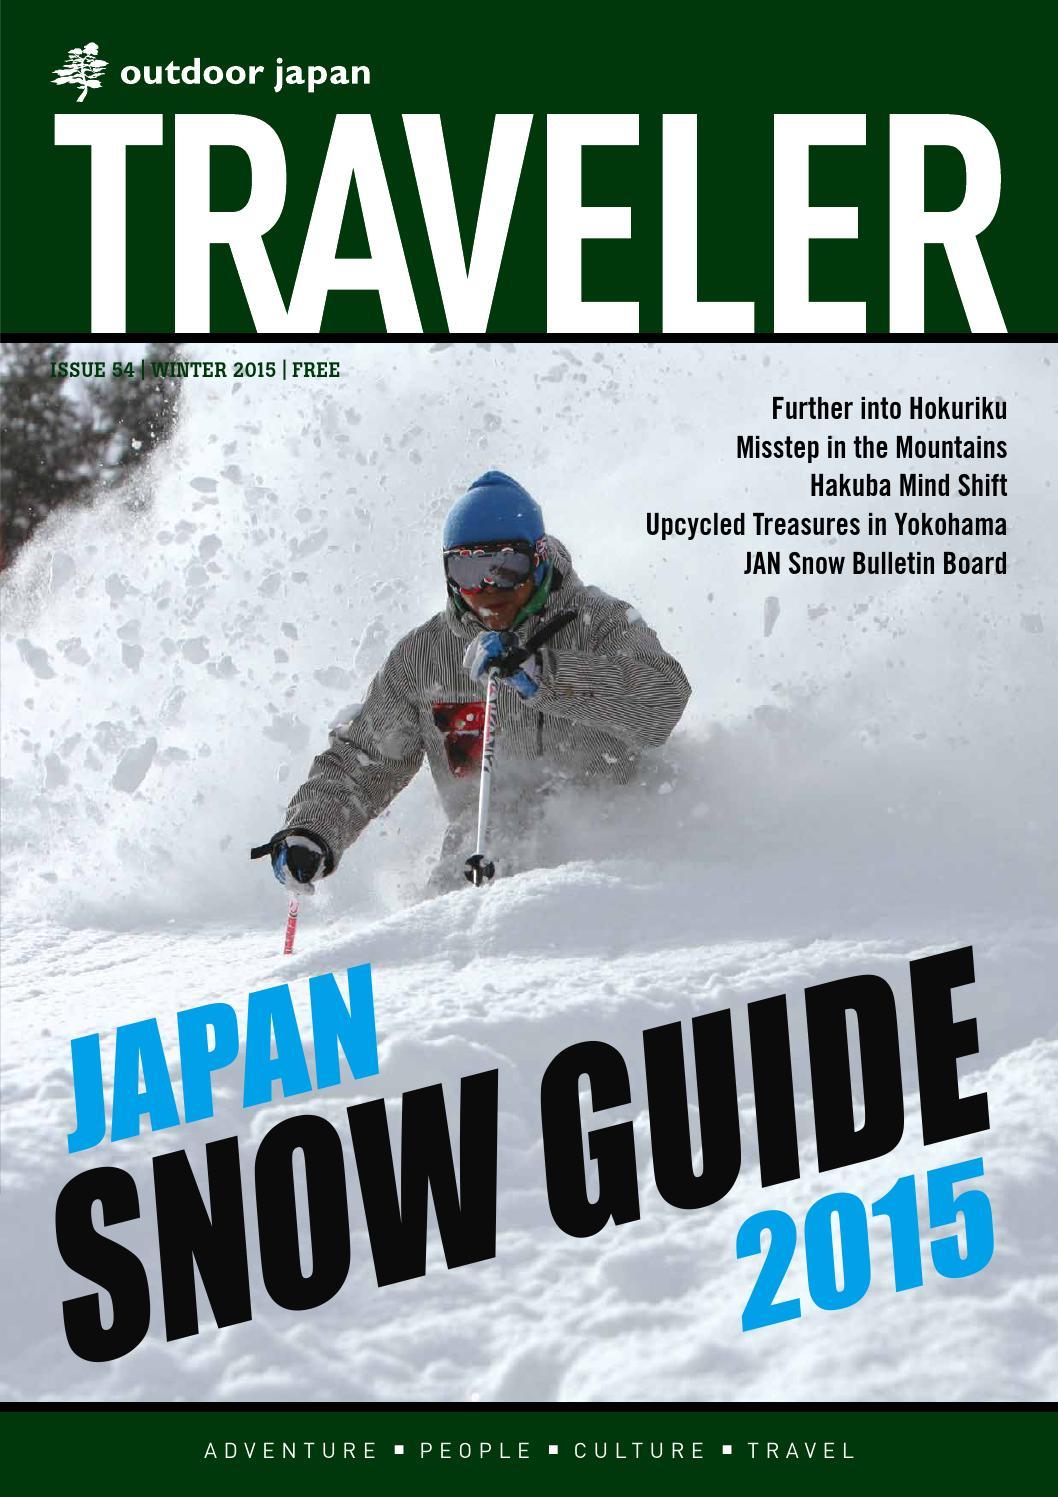 MORITZ SWITZERLAND SKI SNOWBOARD WINTER SPORT VINTAGE REPRO FREE S//H POSTER ST